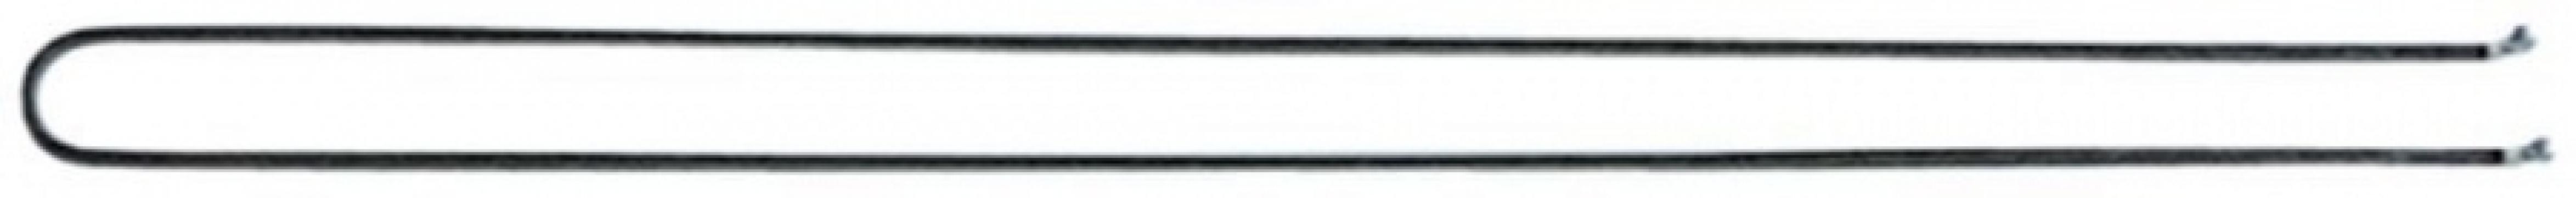 Rezistenta 1100W 230V de la Kalva Solutions Srl